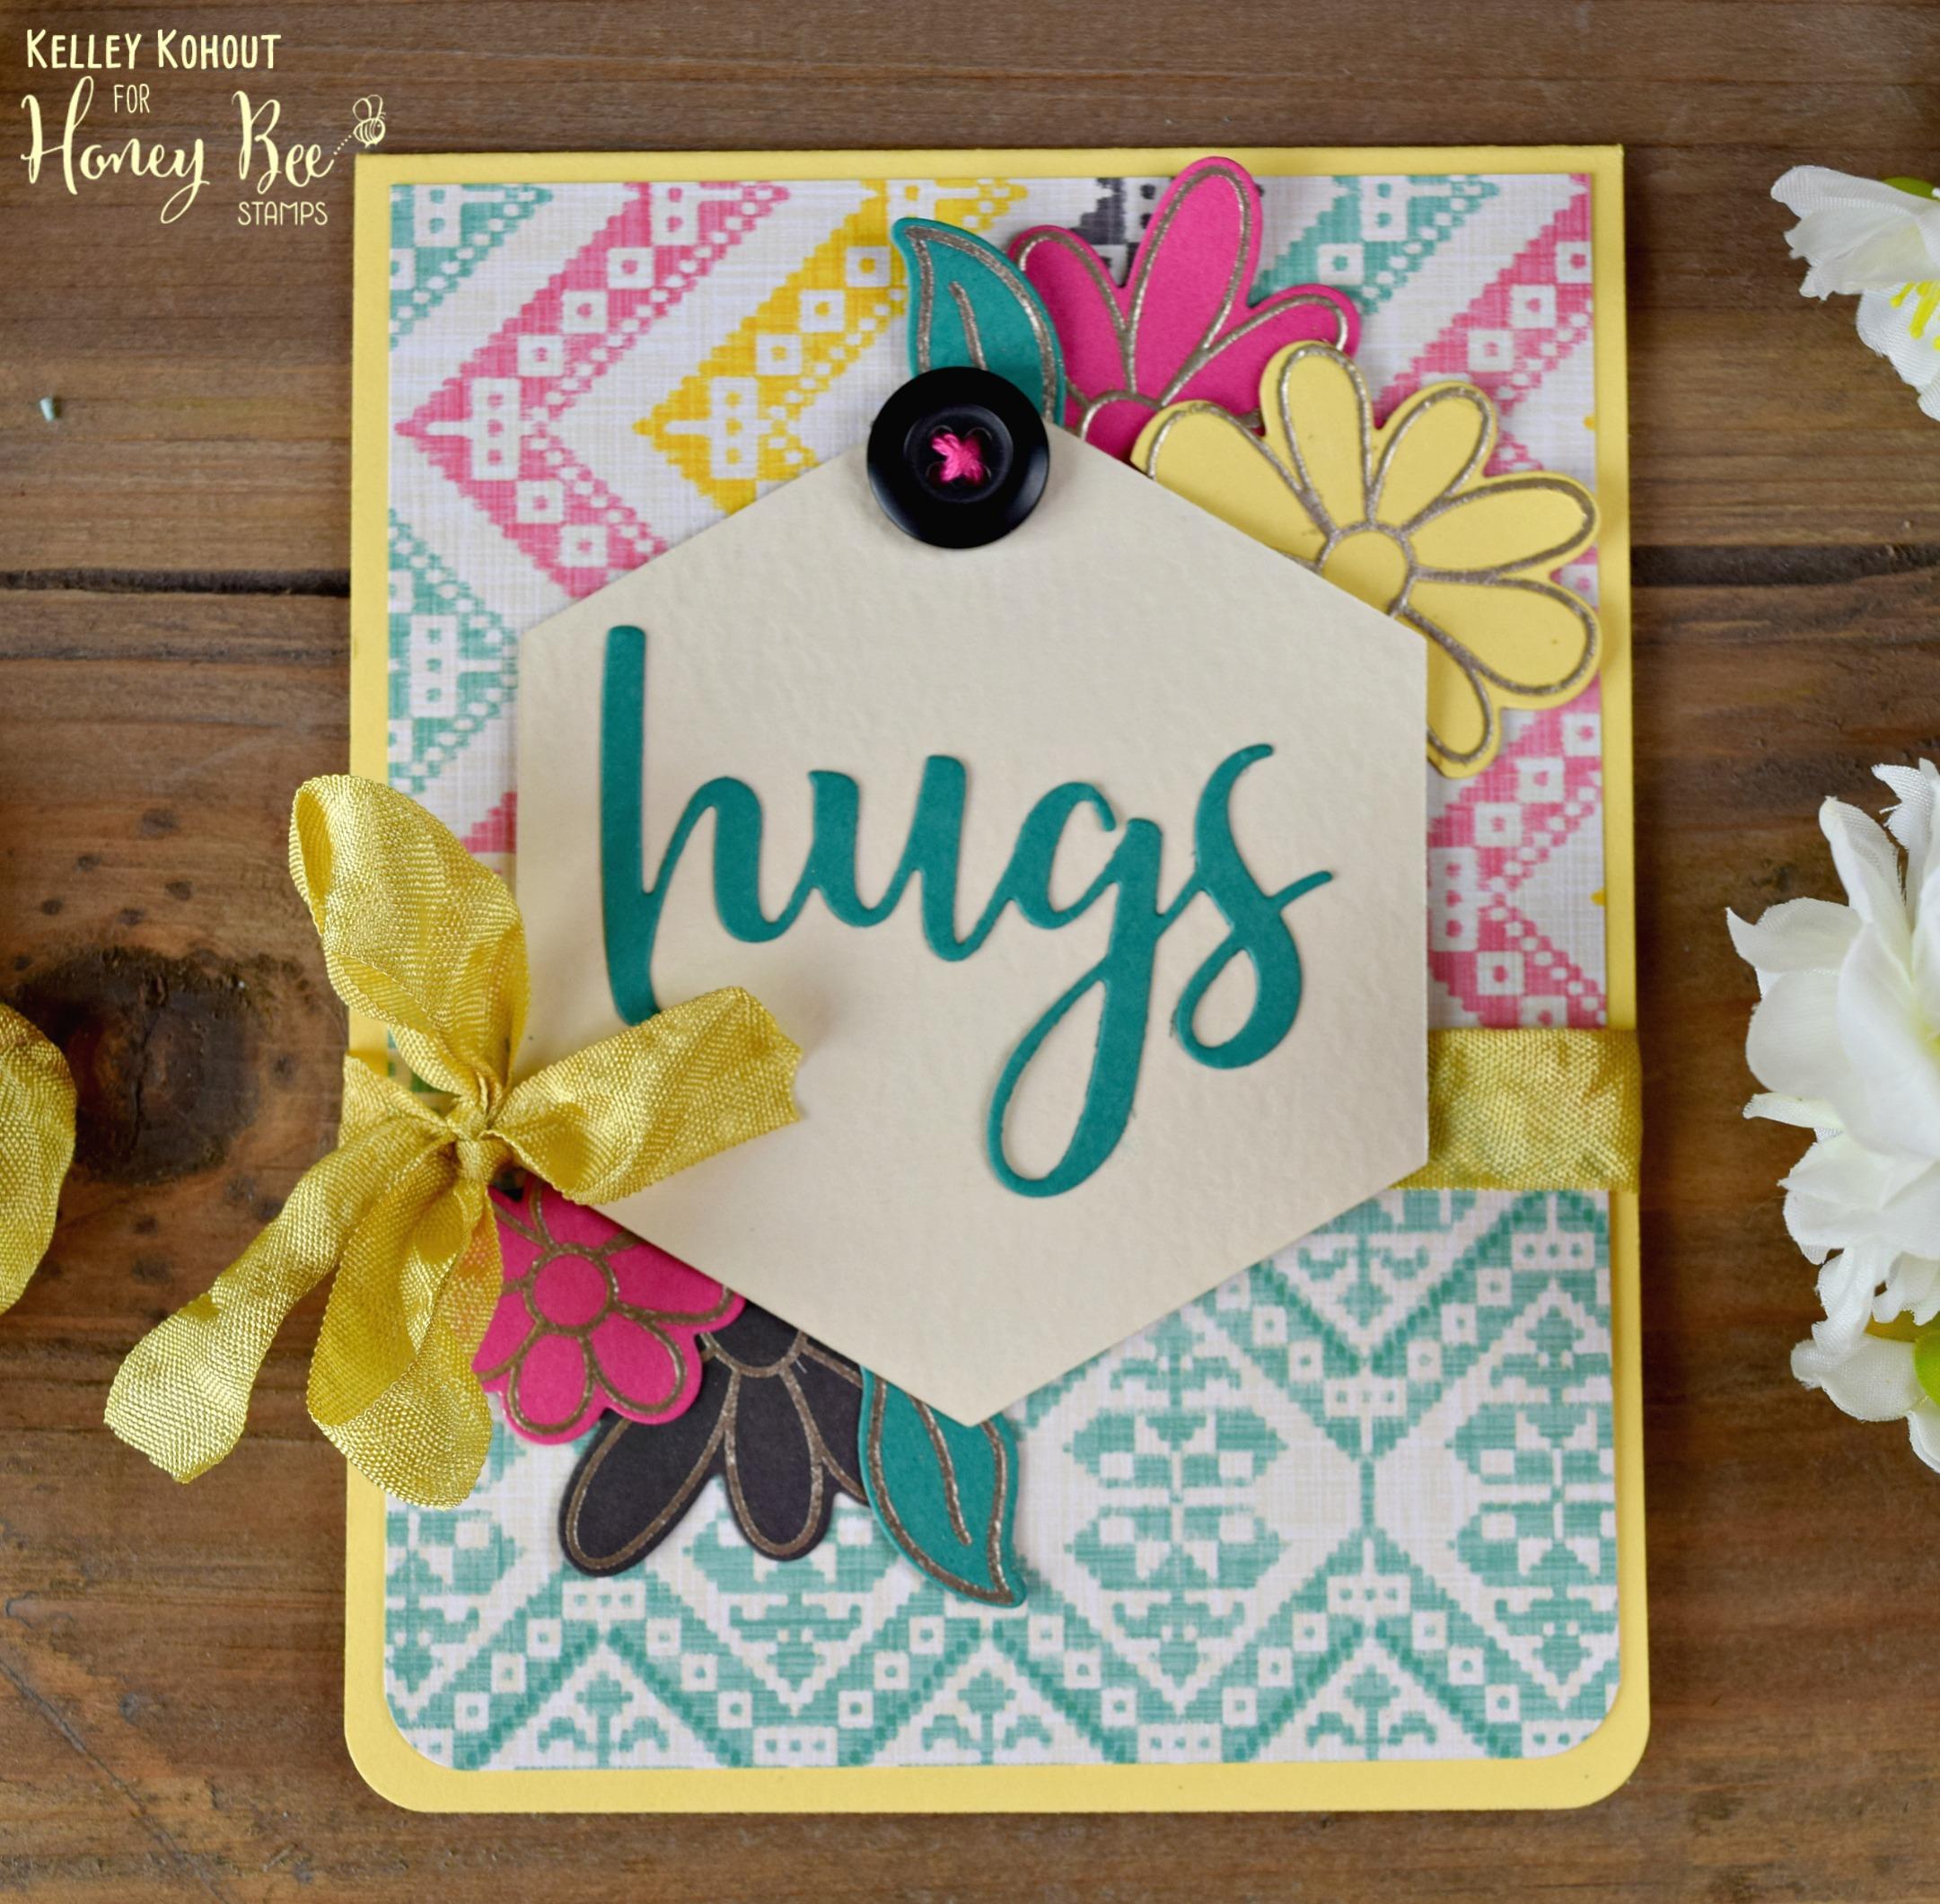 Hugs to you!